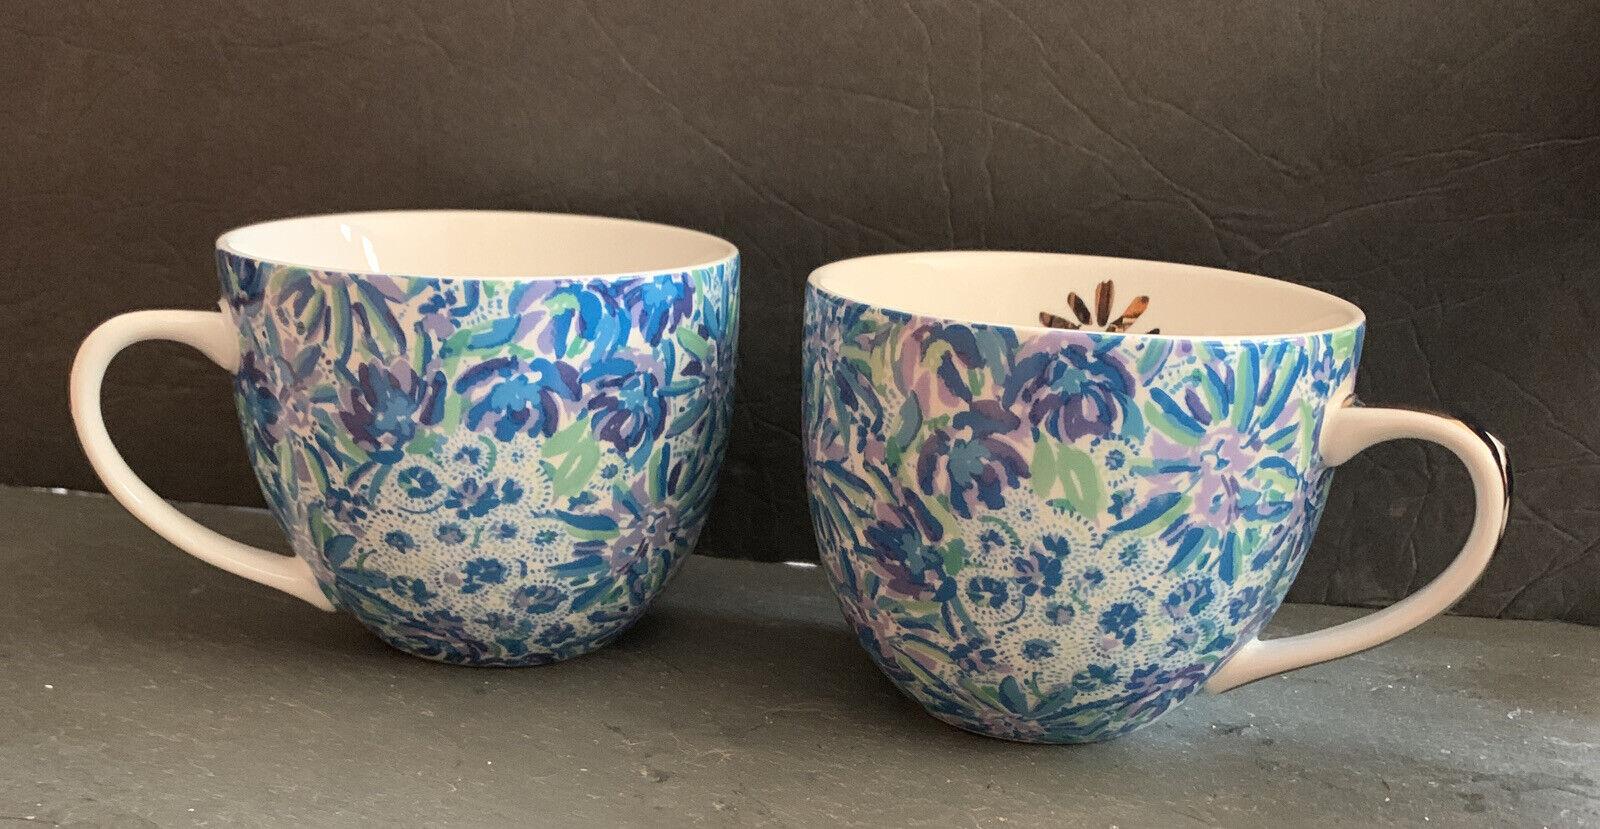 Set Of 2 Lilly Pulitzer Ceramic Mugs Blue Floral Coffee Tea Mug Cups 12oz For Sale Online Ebay